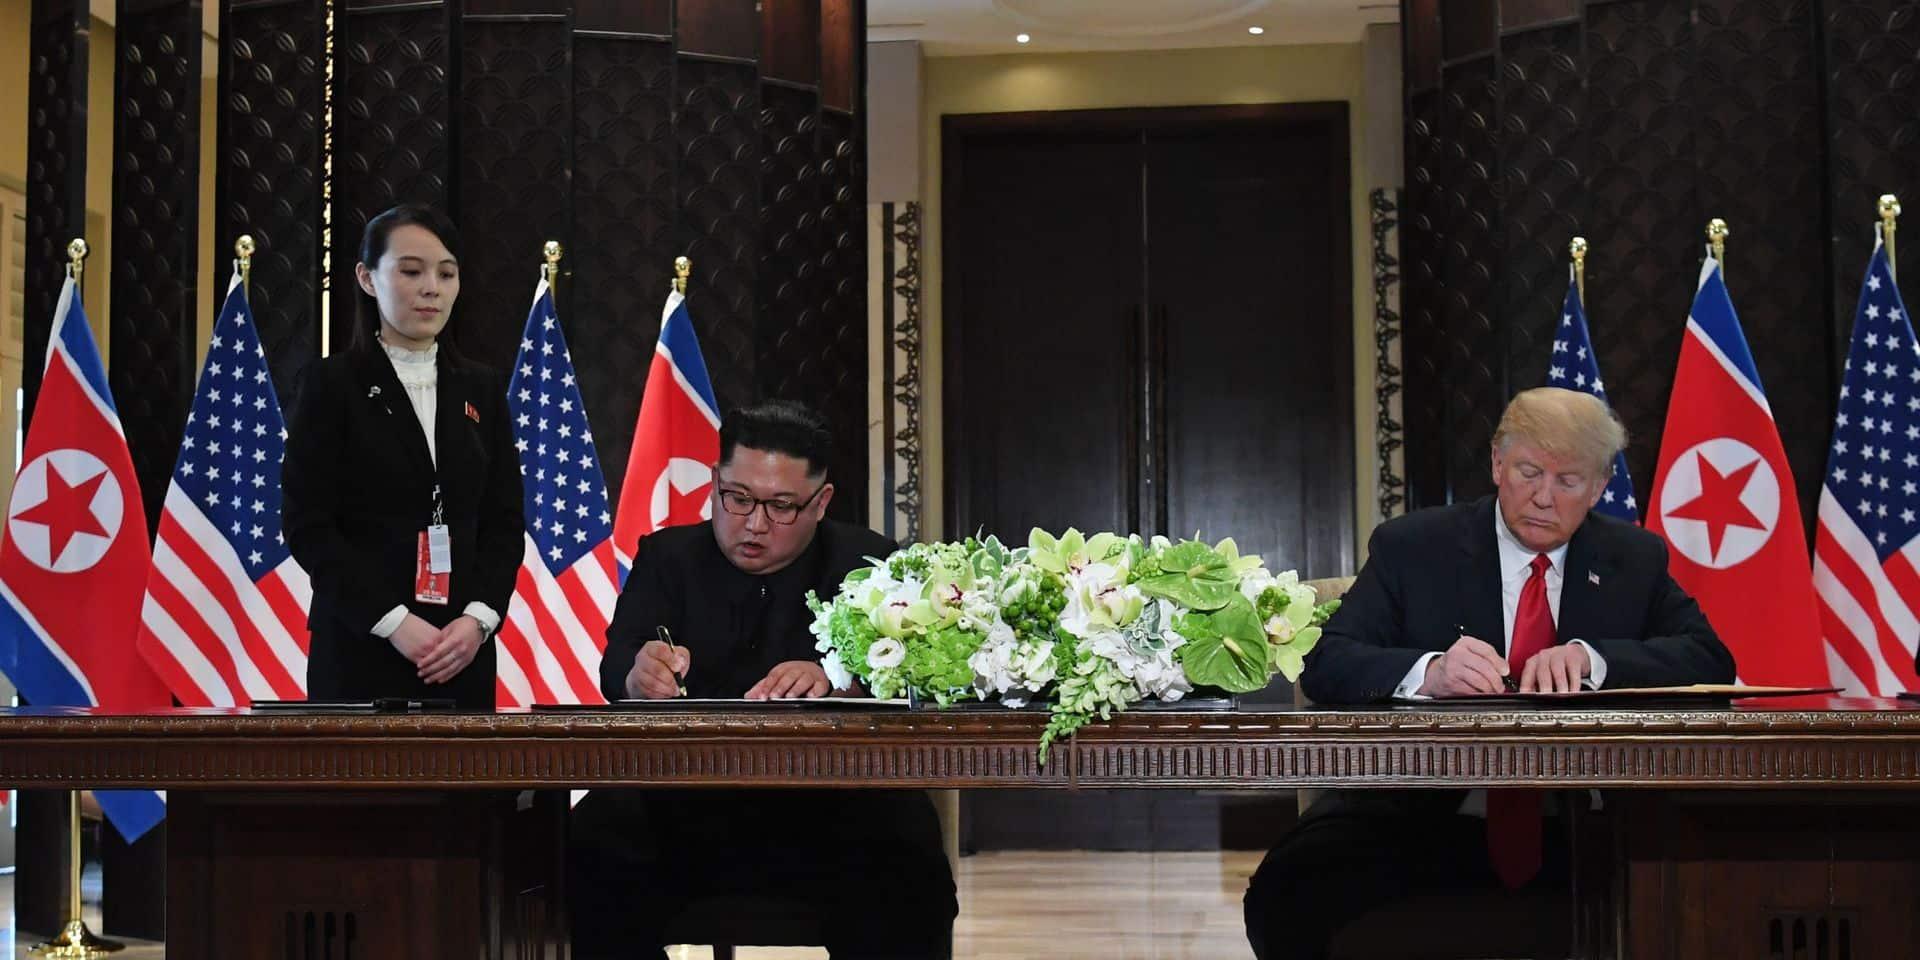 """Vantardises ennuyeuses"" de la part de ""quelqu'un d'orgueilleux"": la soeur de Kim Jong Un tacle Donald Trump"